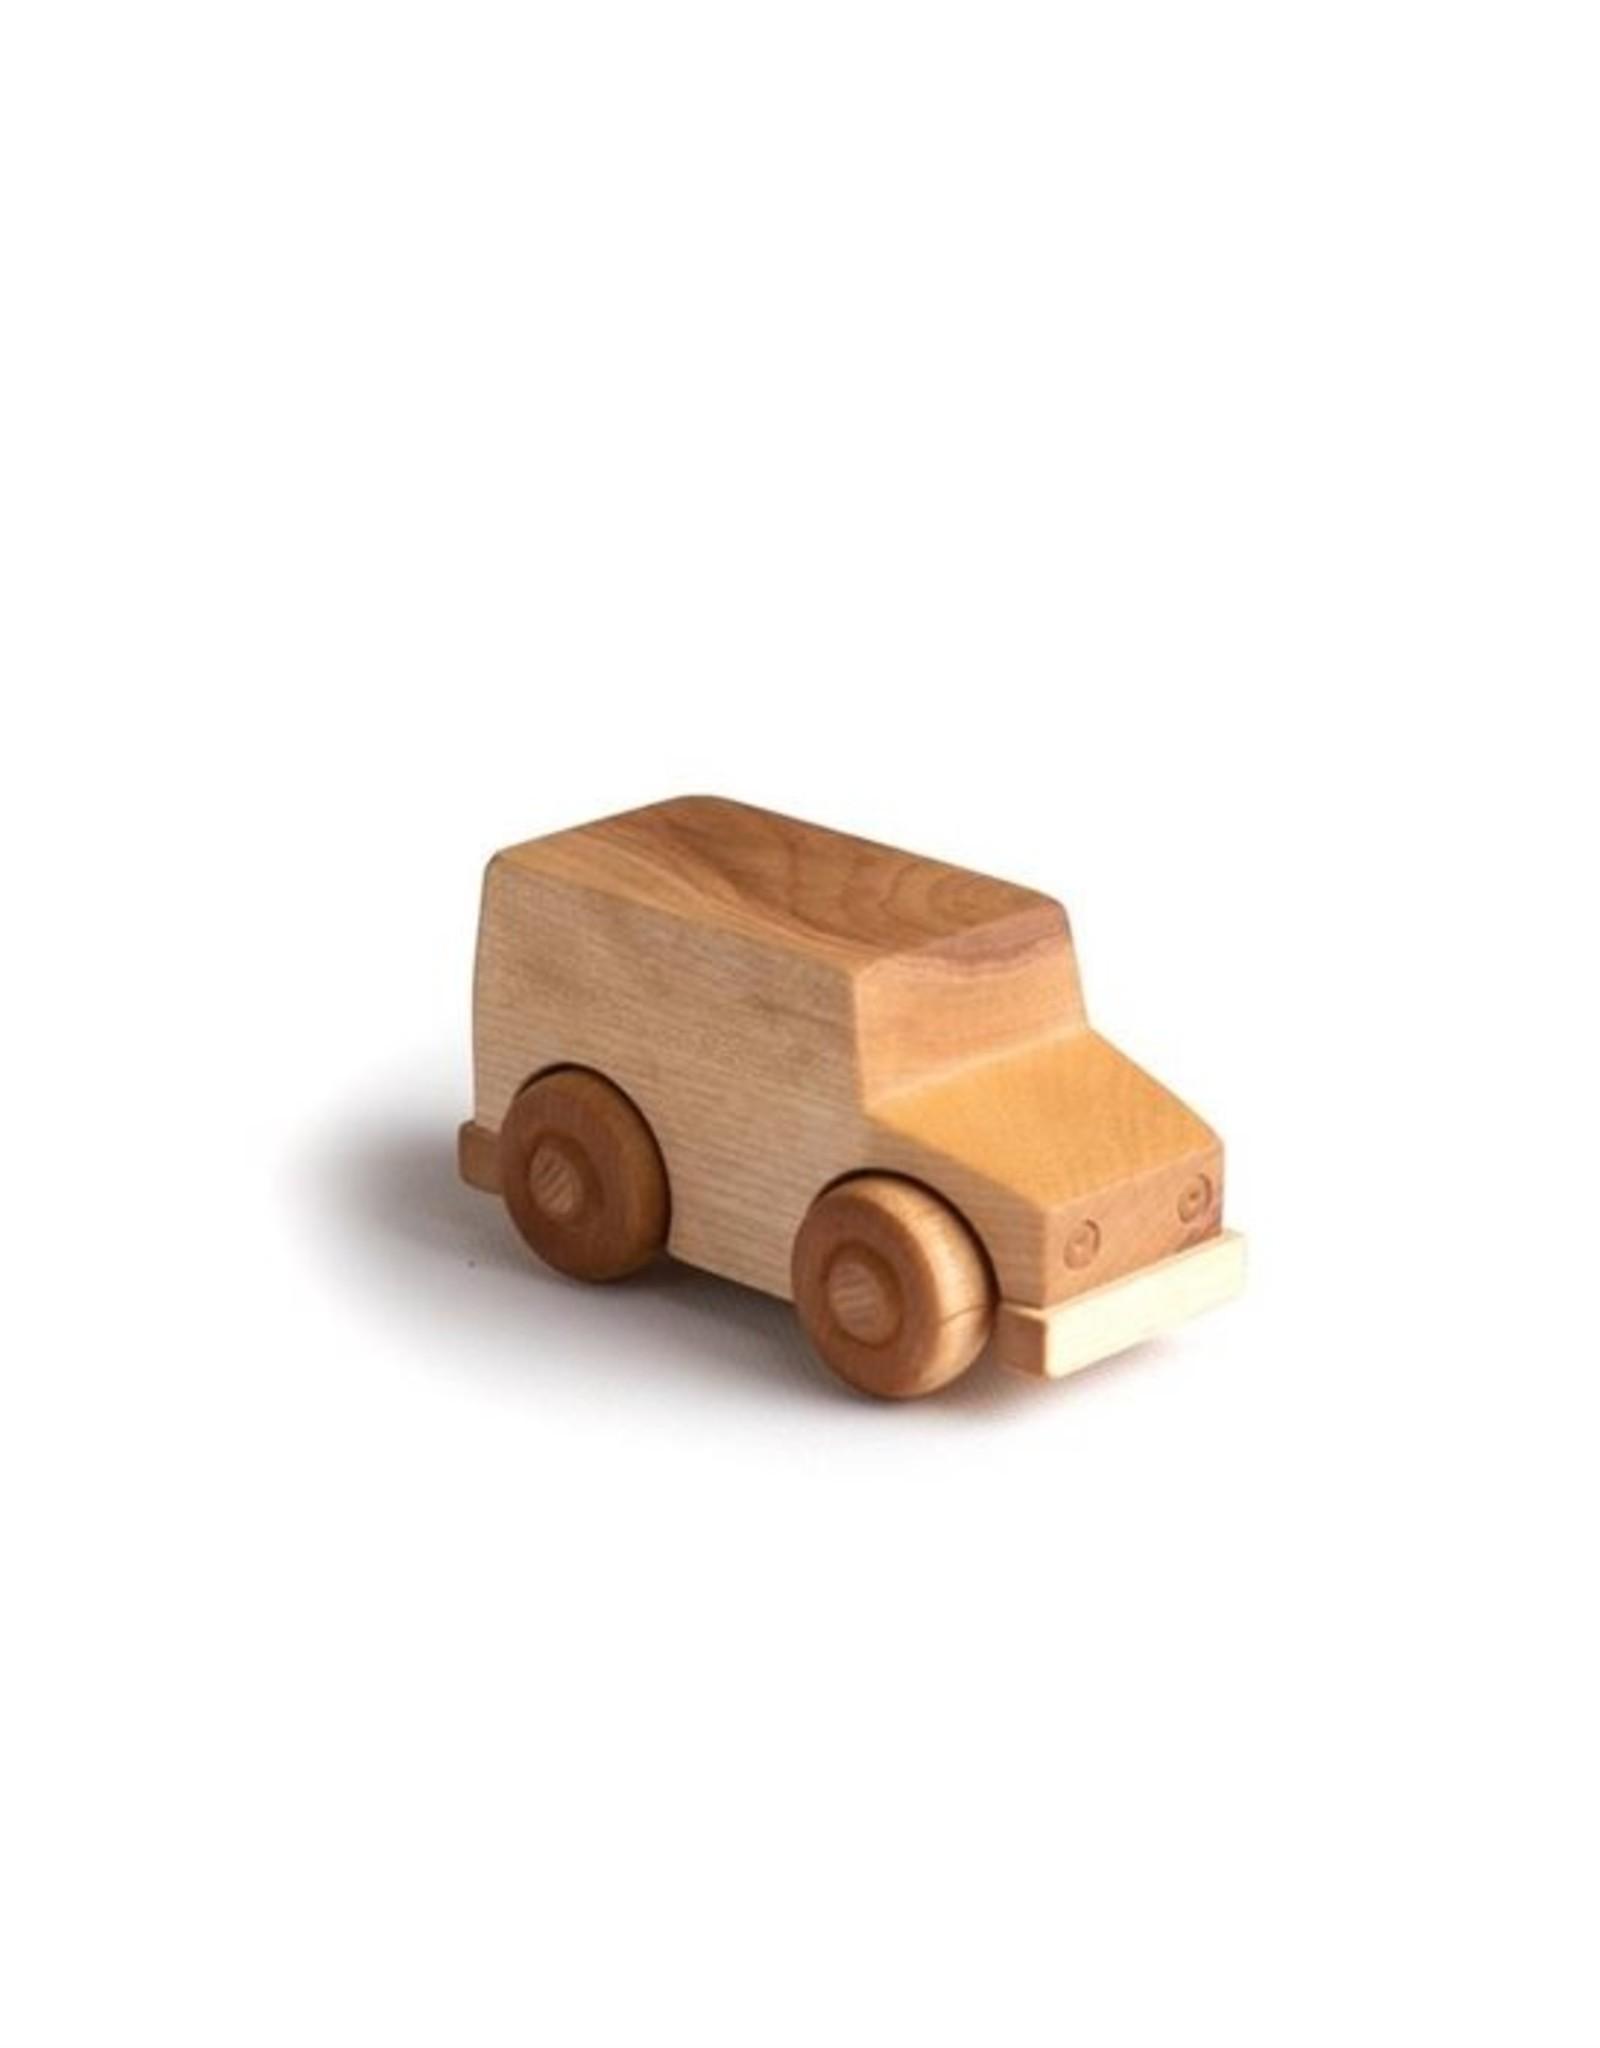 Petit Bosc Small truck